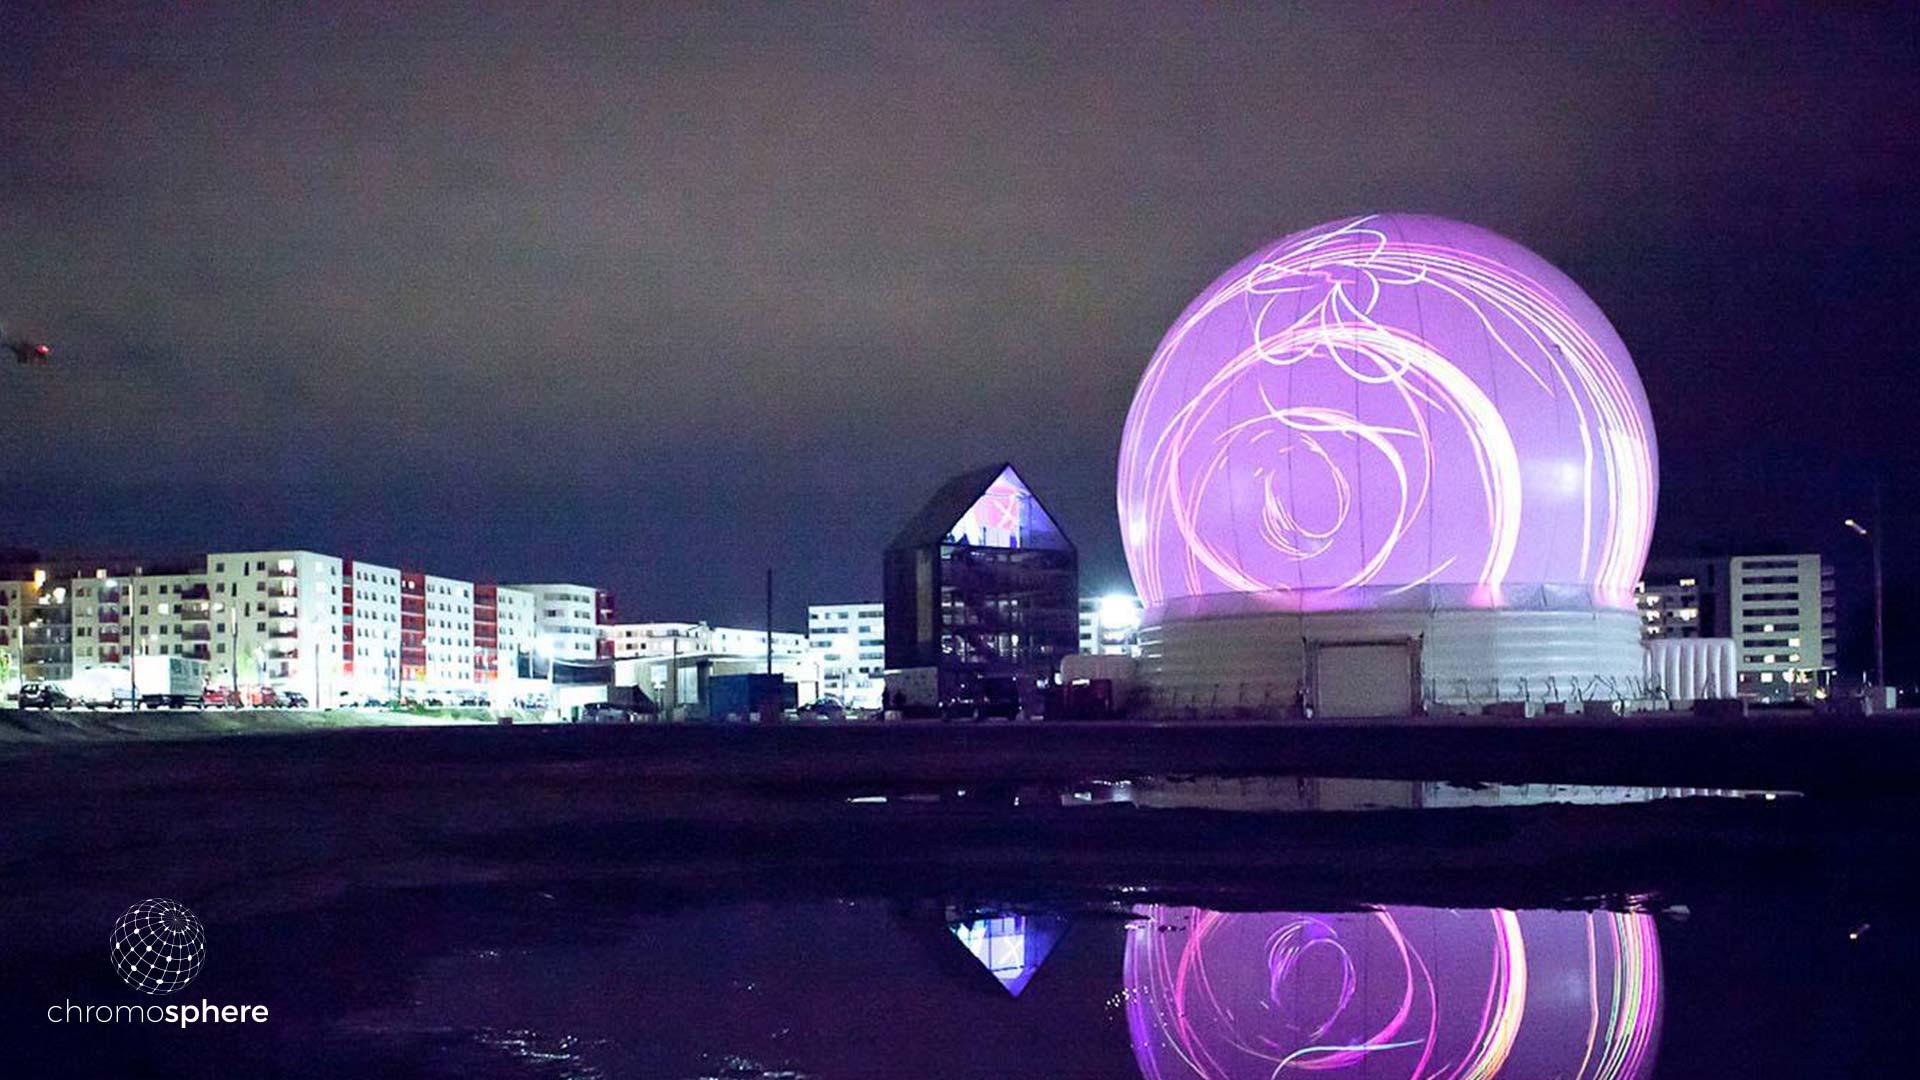 Image di: Chromosphere Festival